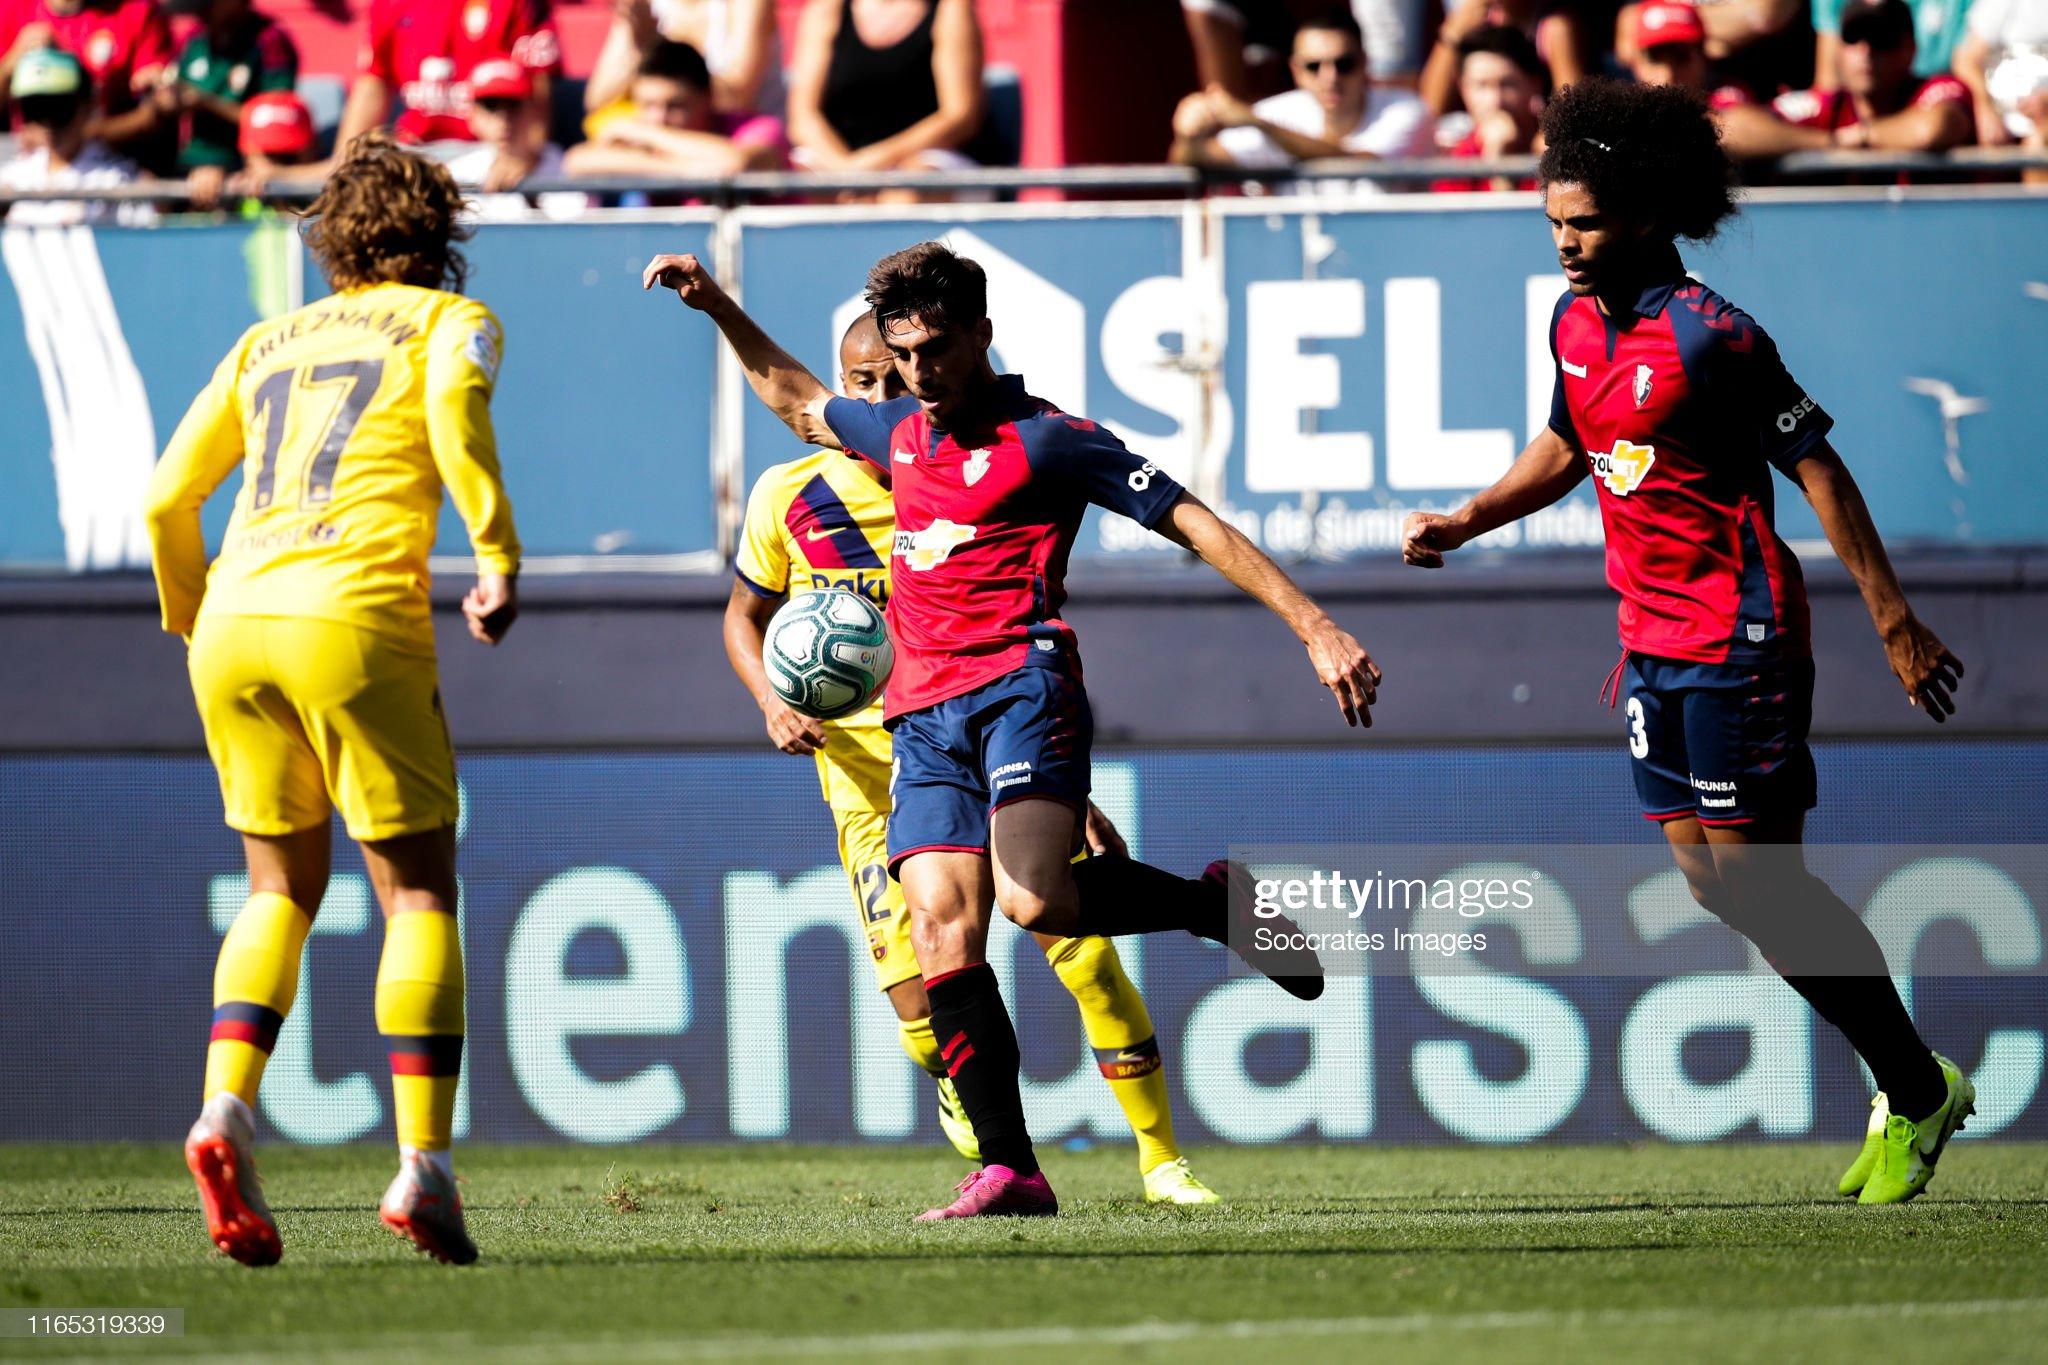 صور مباراة : أوساسونا - برشلونة 2-2 ( 31-08-2019 )  Nacho-vidal-of-ca-osasuna-during-the-la-liga-santander-match-between-picture-id1165319339?s=2048x2048